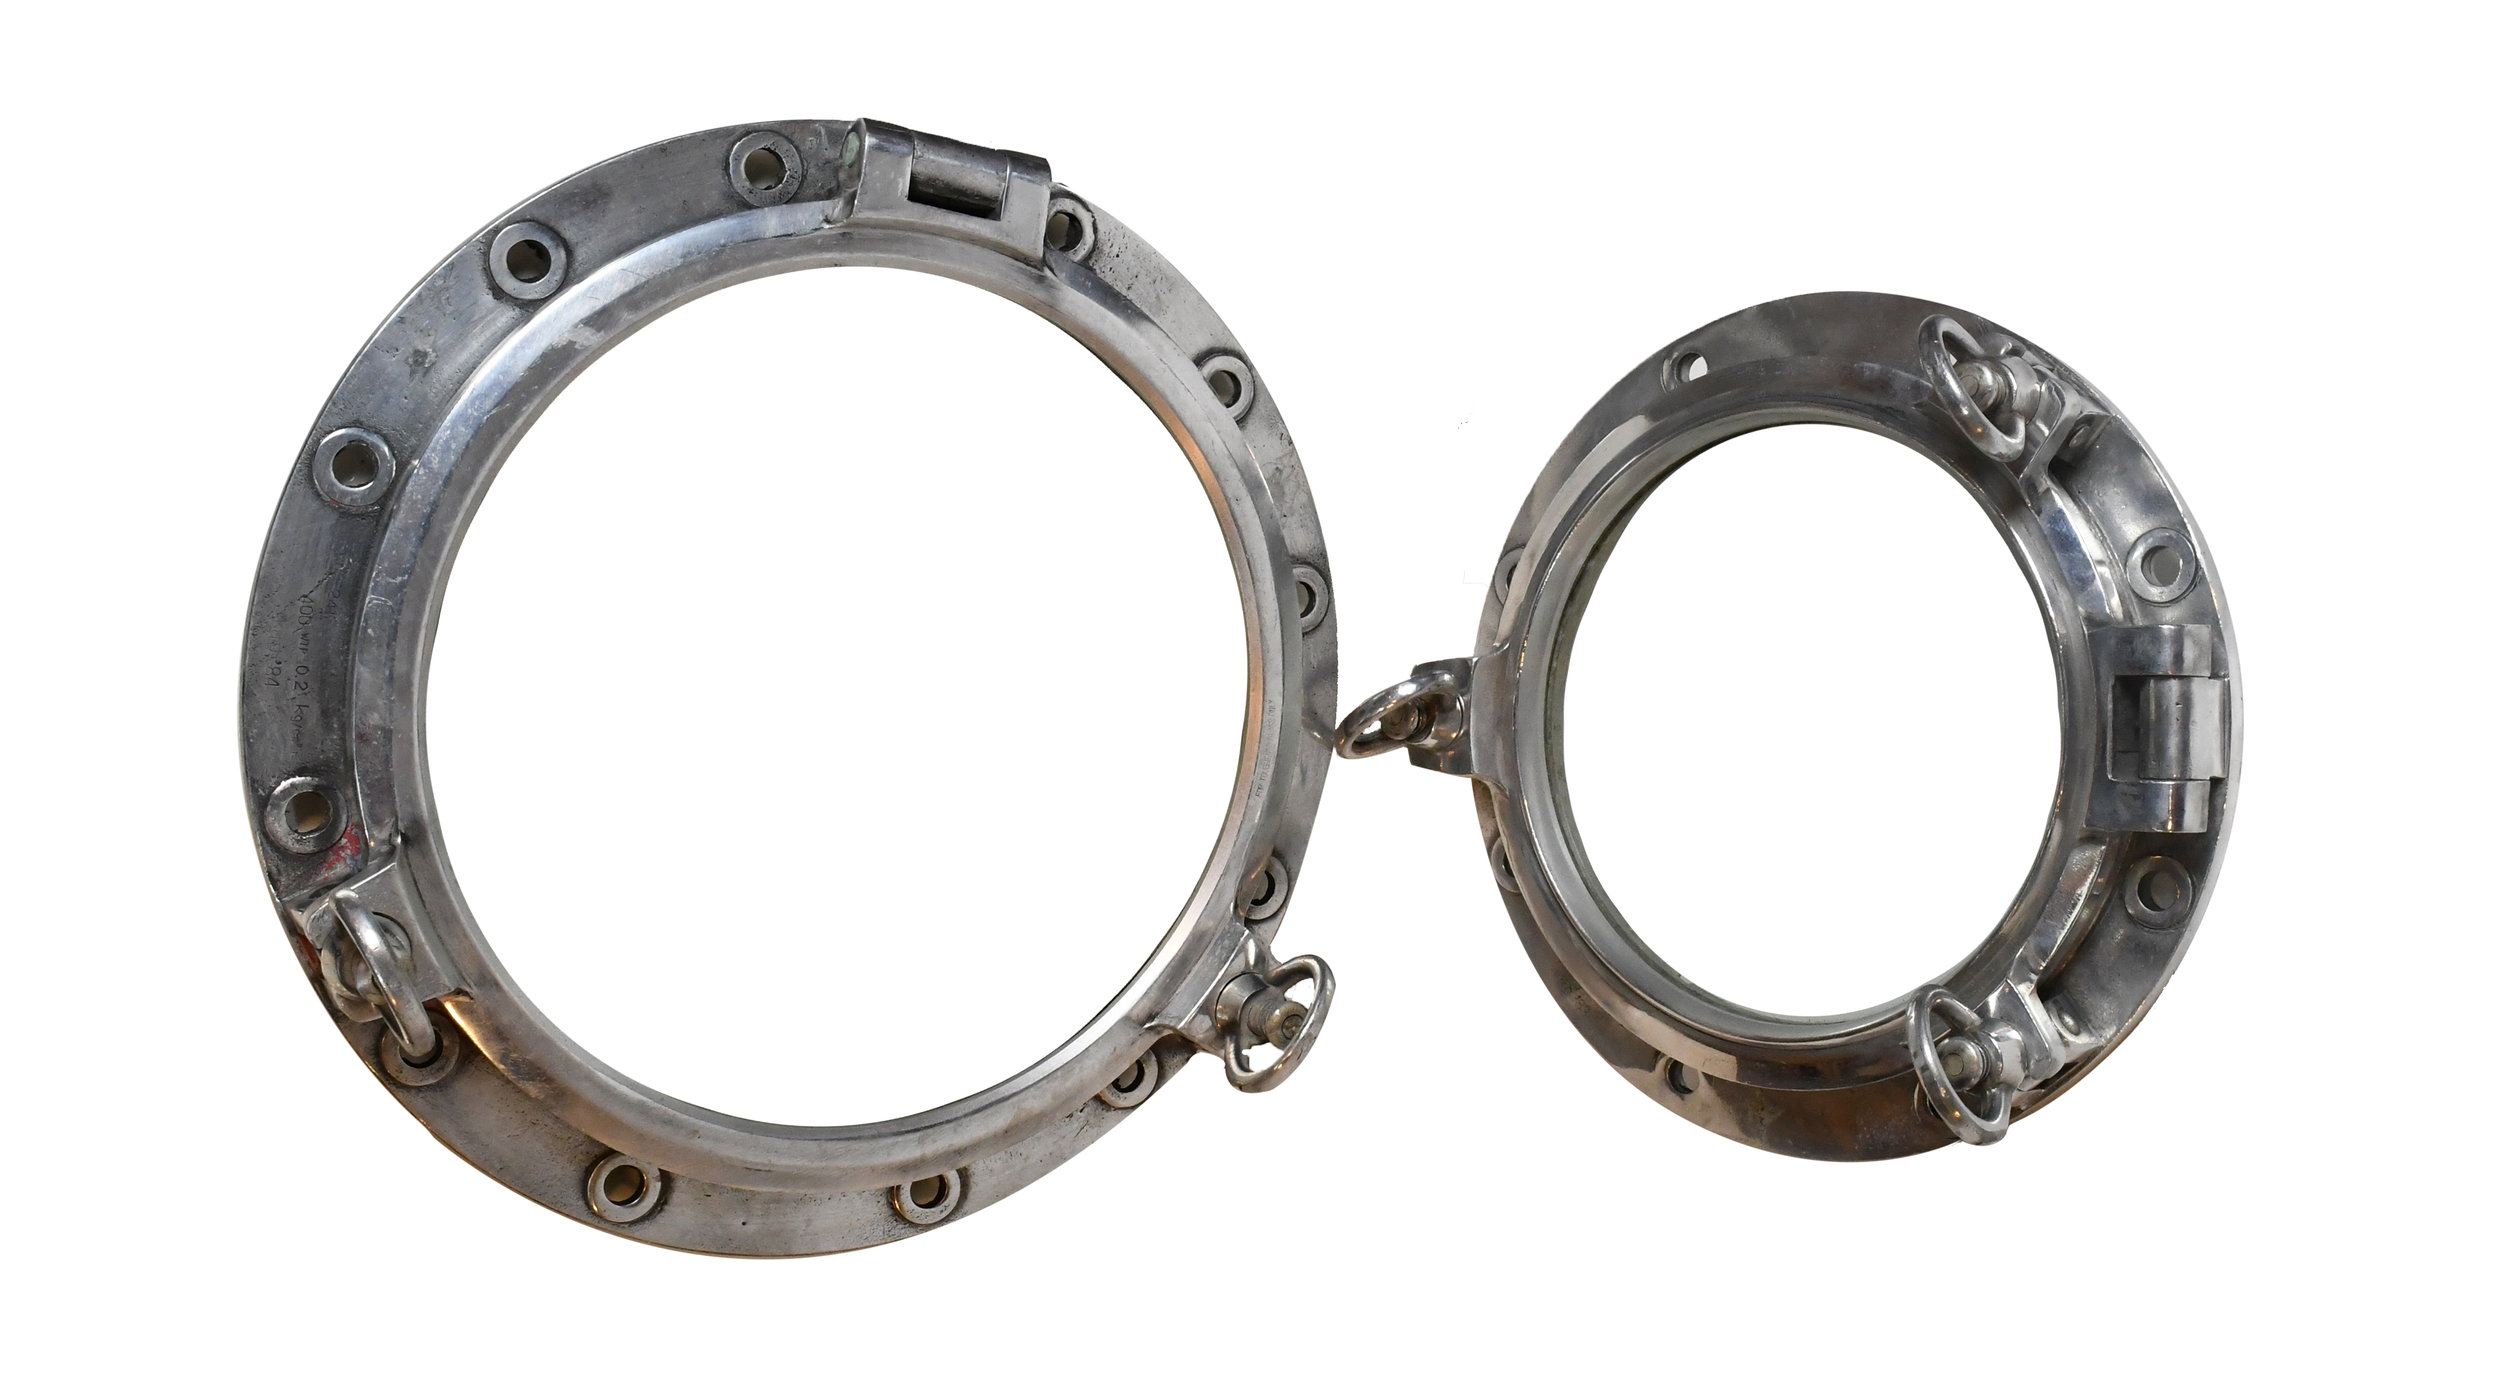 47470-porthole-nickle-plates-both-1.jpg